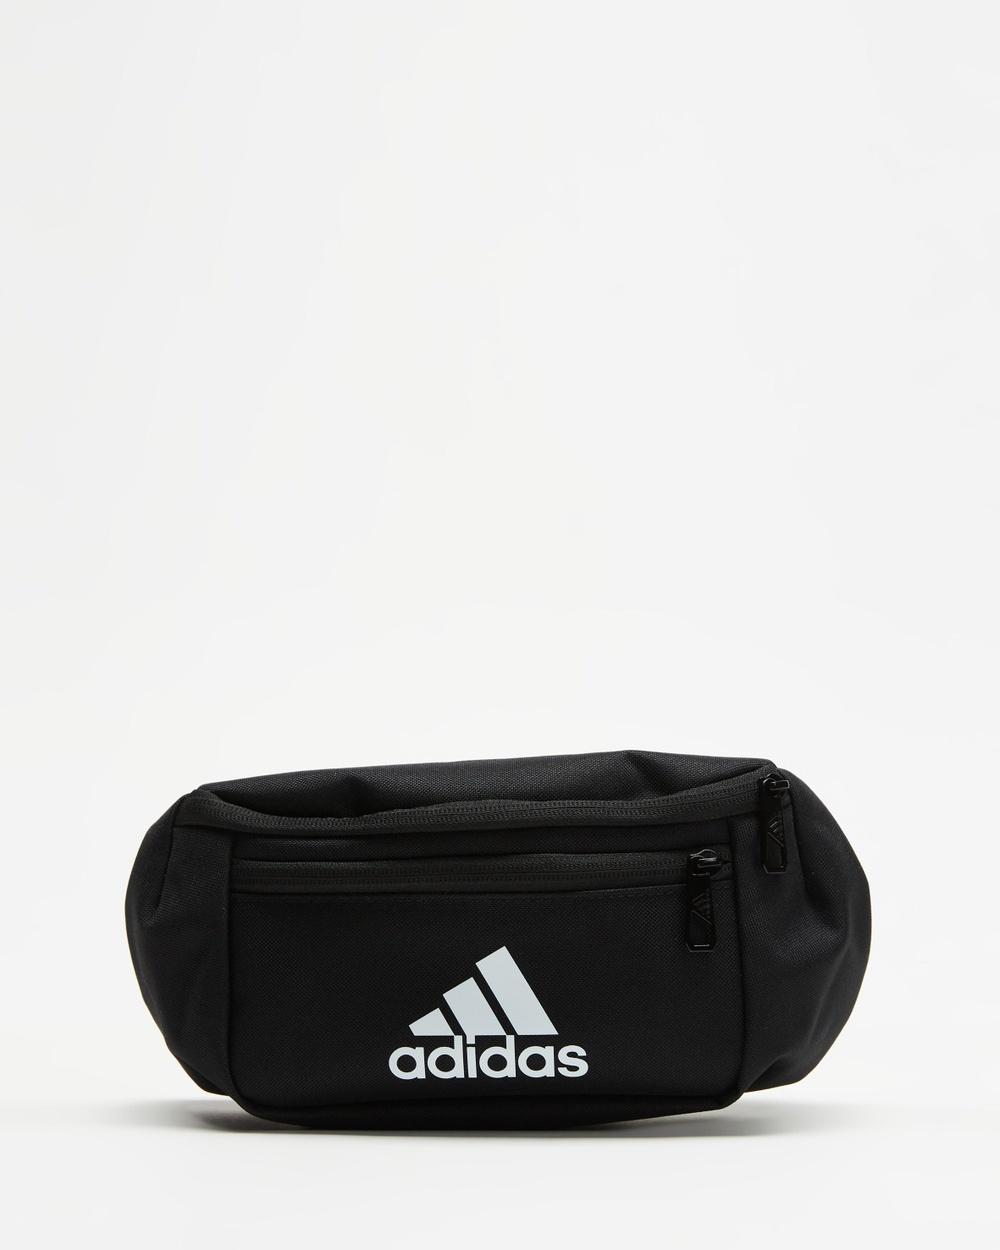 adidas Performance Classic Essential Waist Bag Bum Bags Black